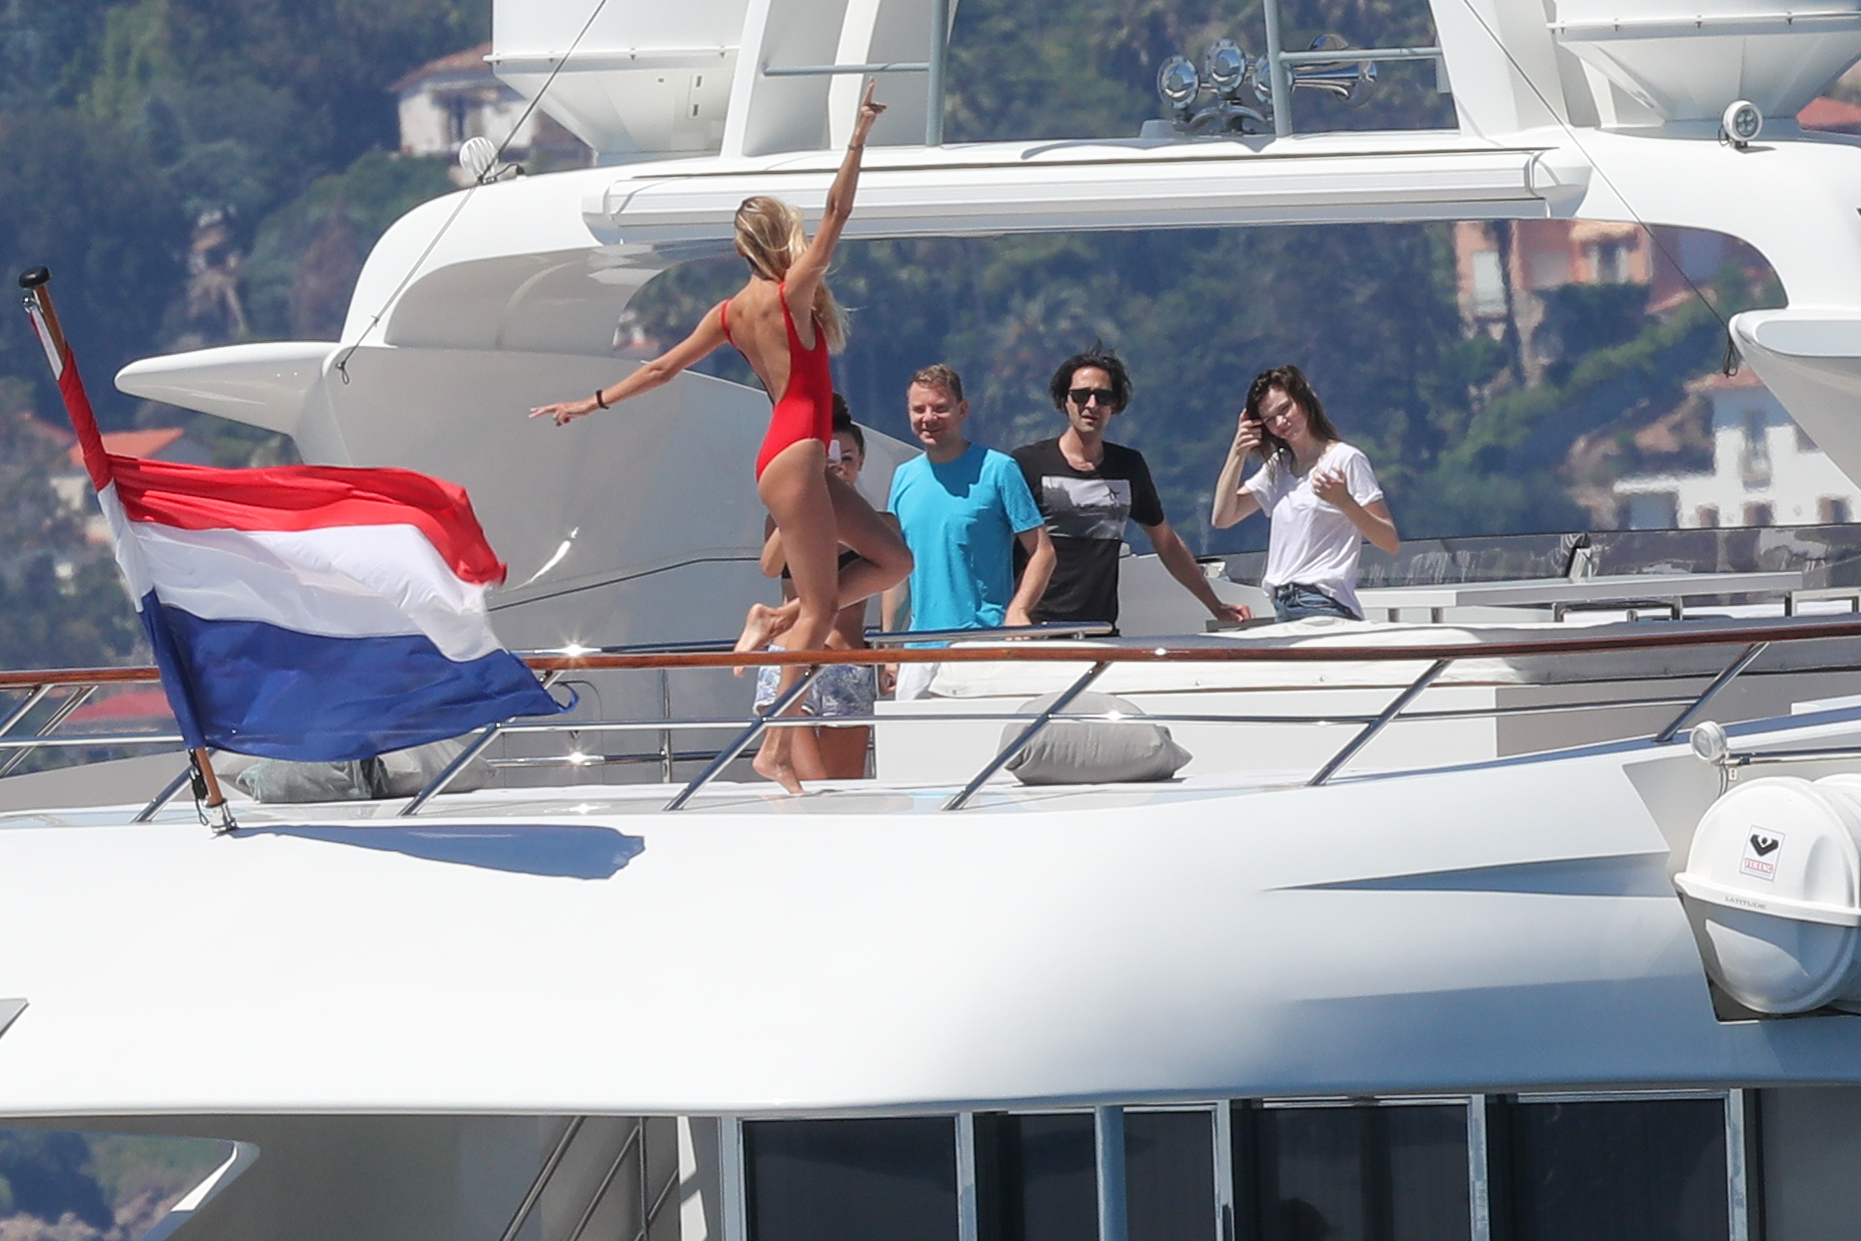 все развлекаются на яхте хотите